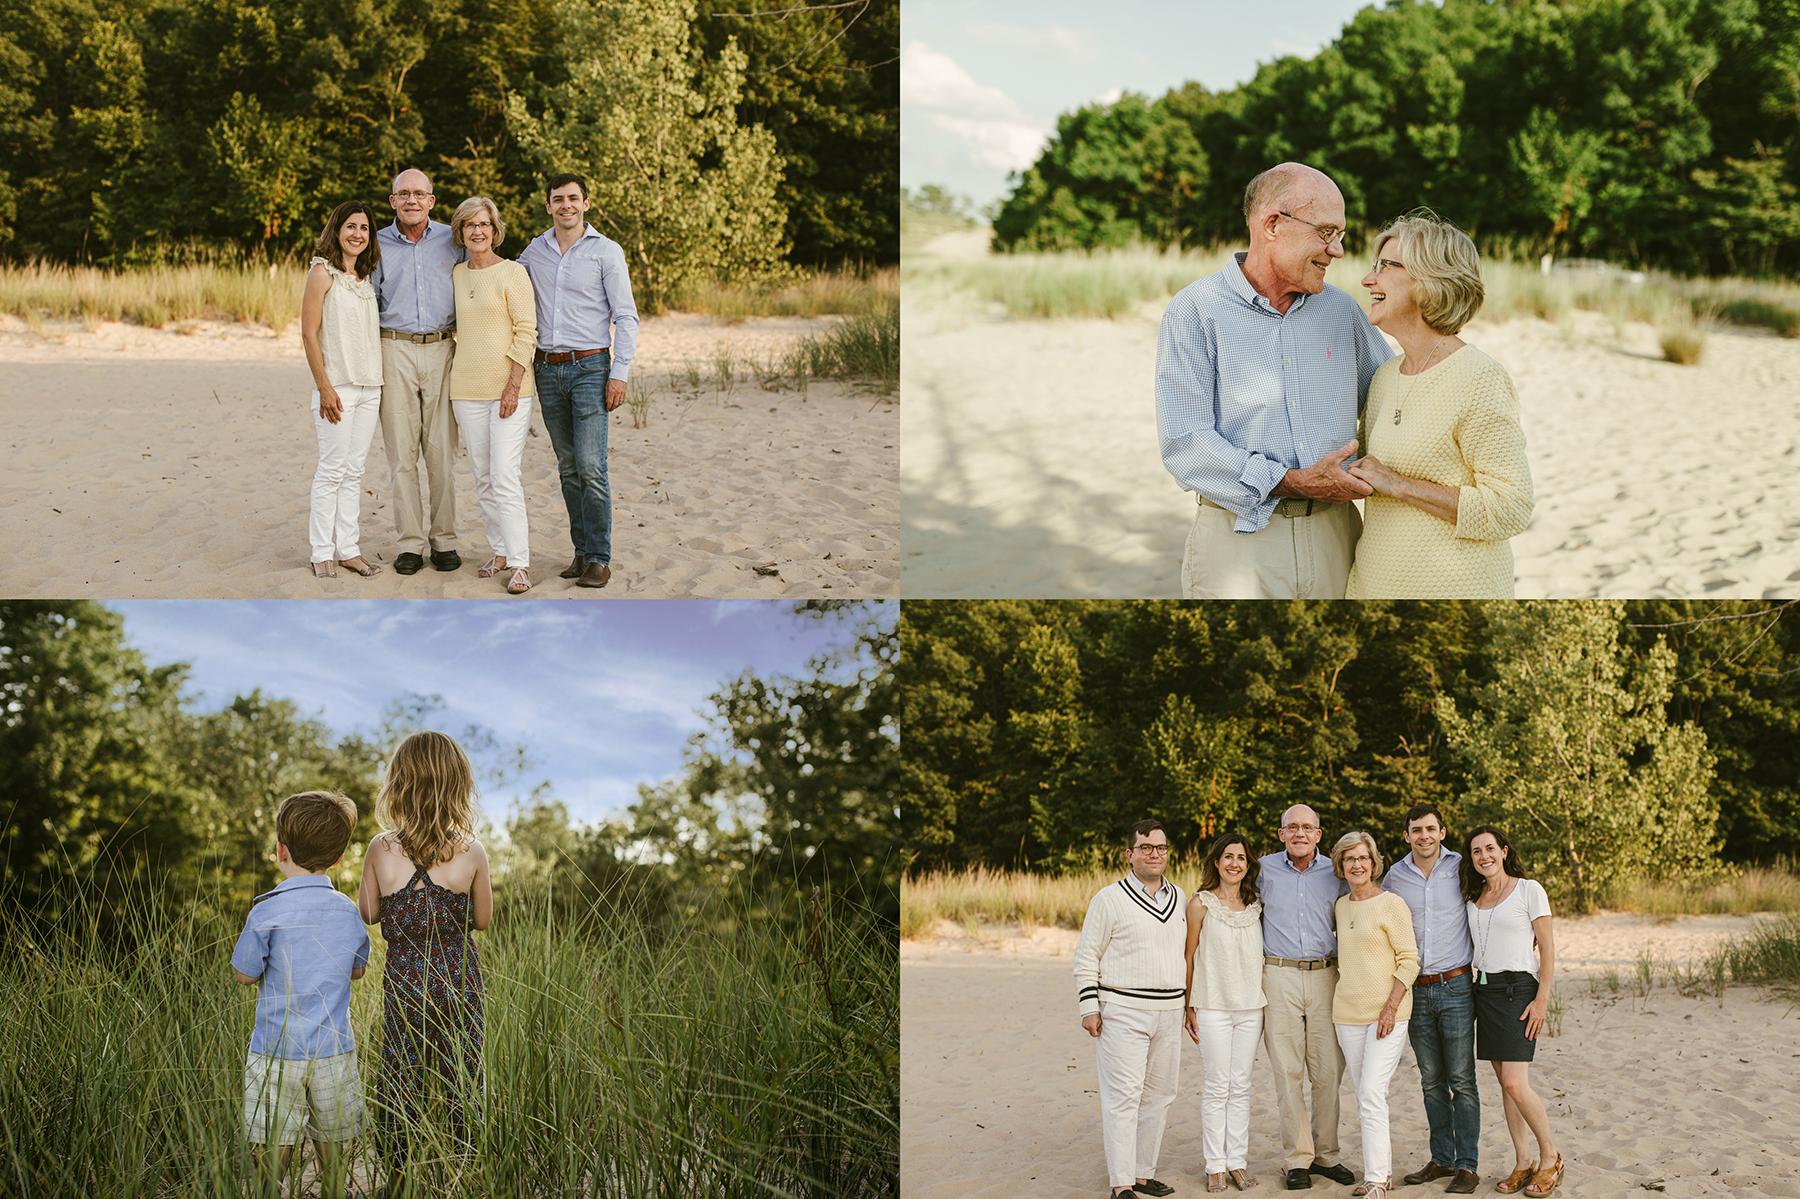 004 lake-michigan-family-session.jpg